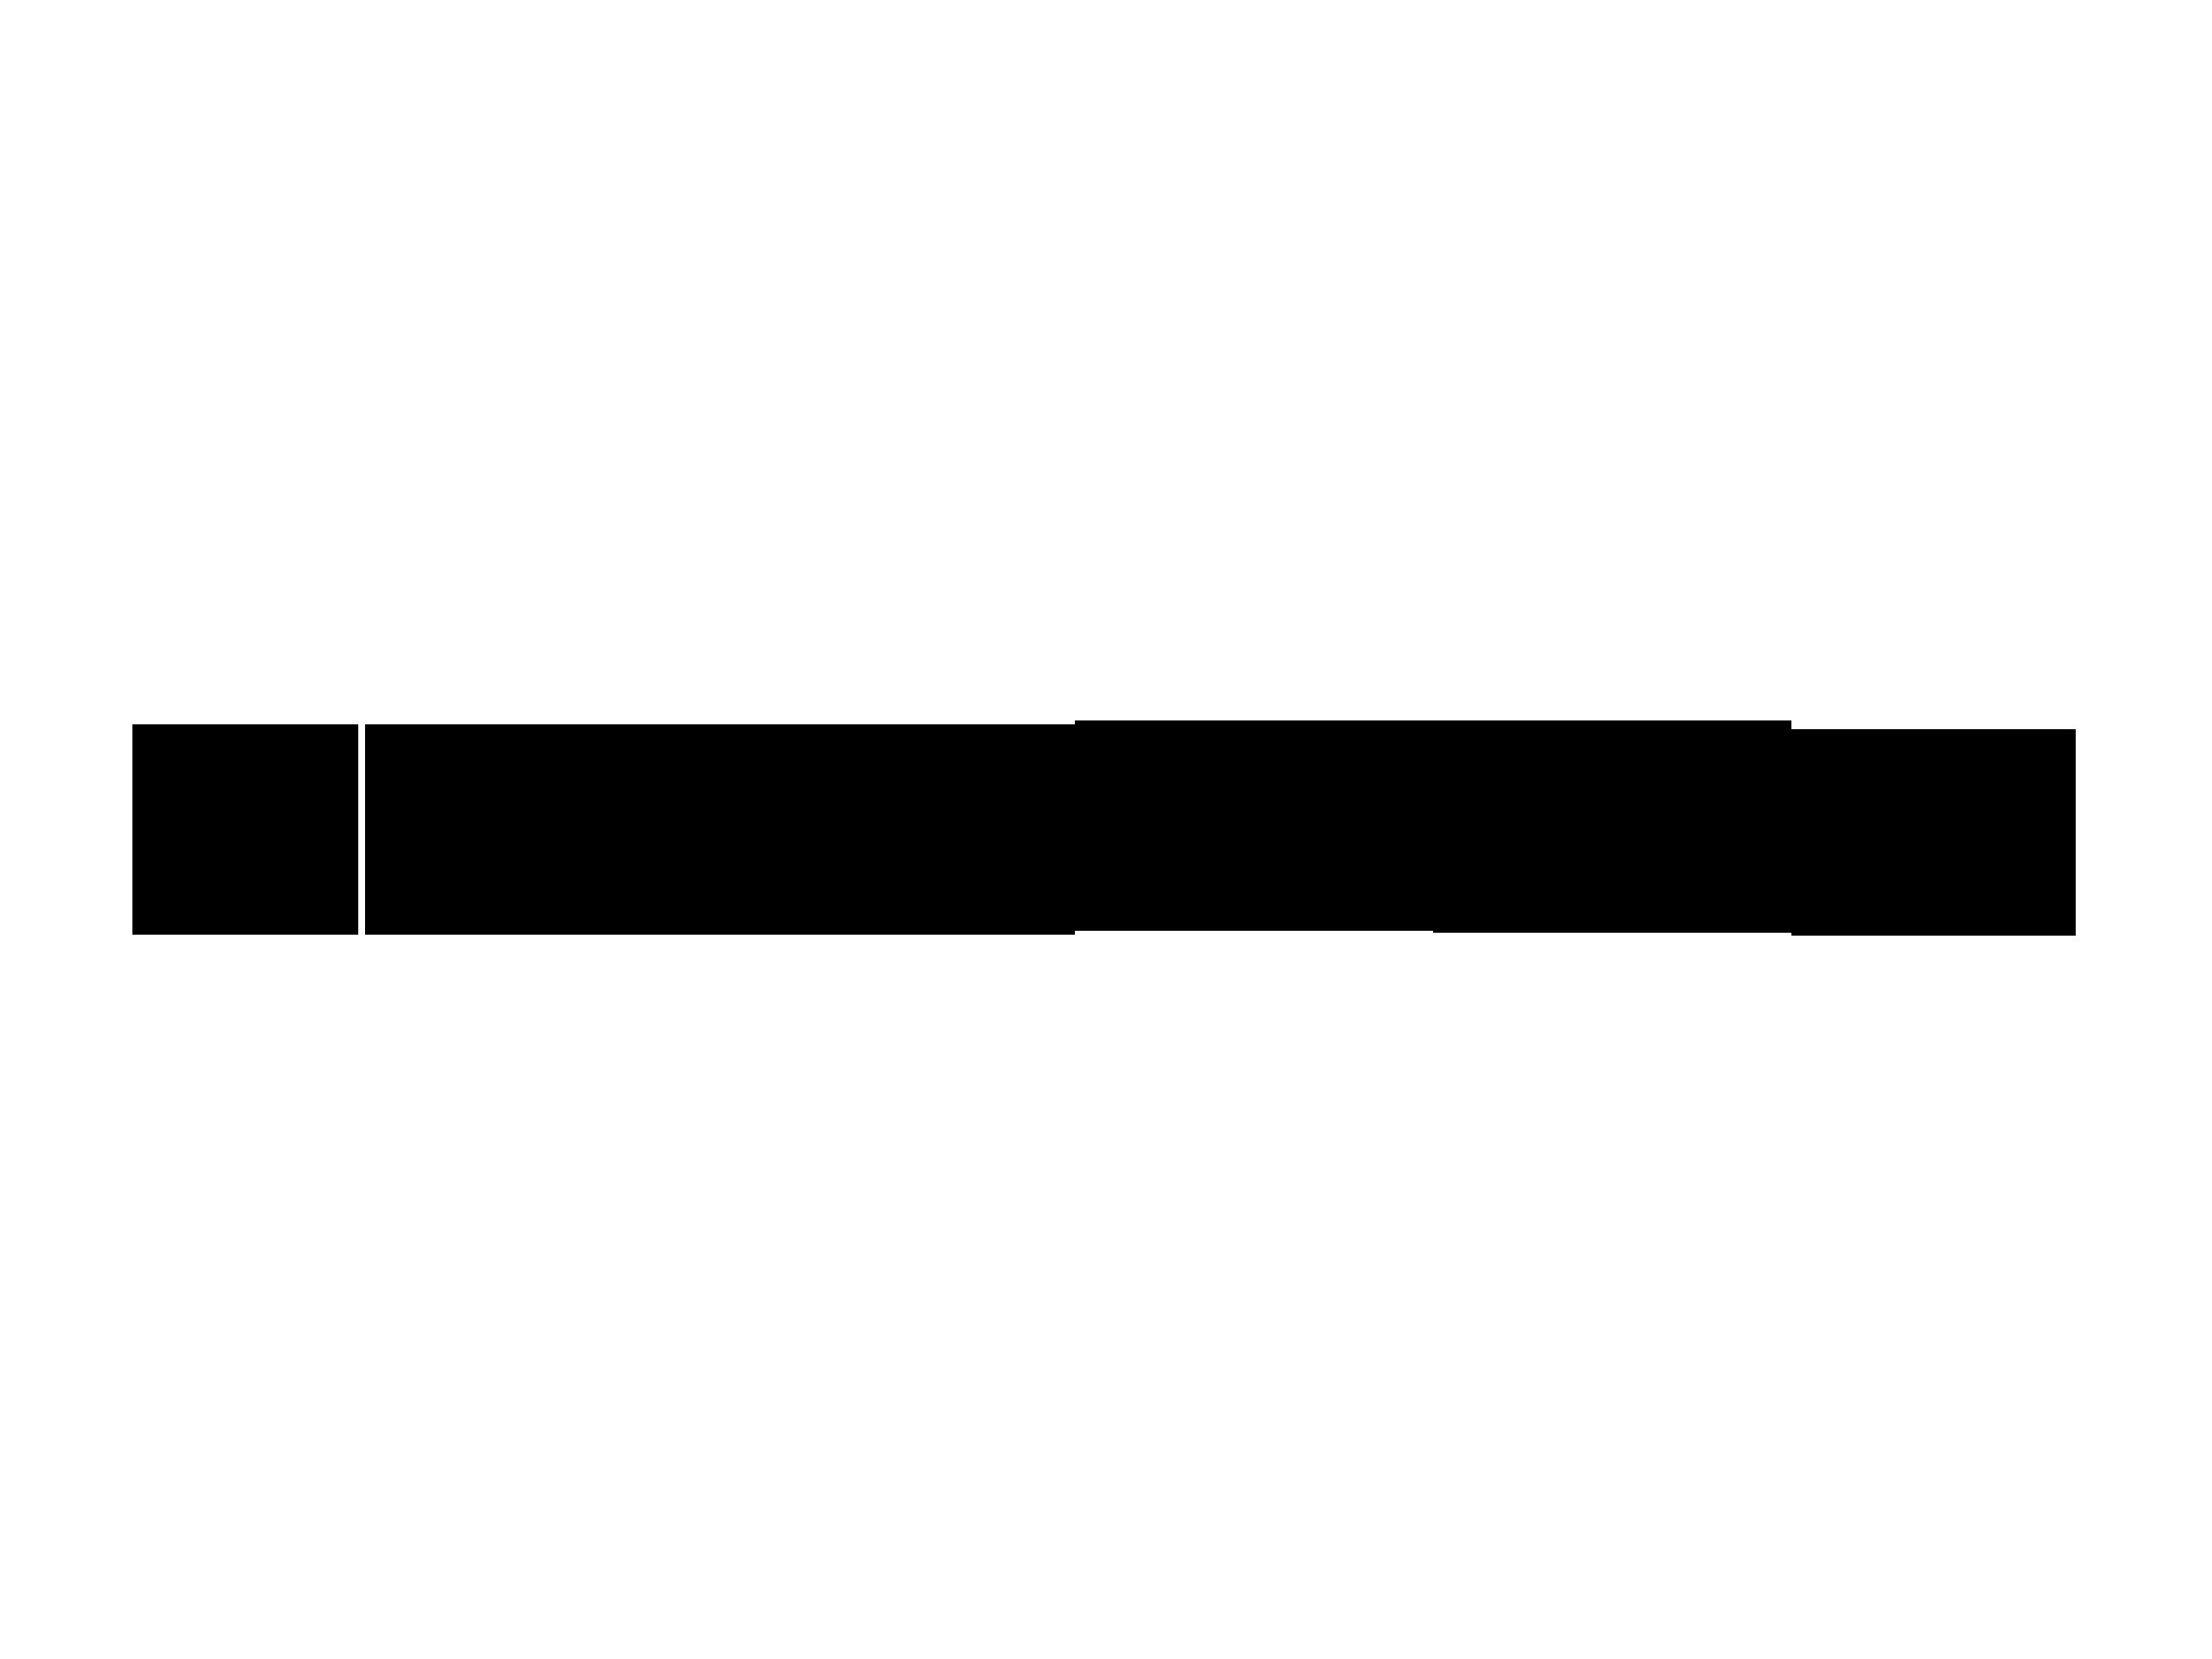 Giorgio Armani, Giorgio Armani Si Passione Eau De Parfum, Giorgio Armani Si Passione Eau De Parfum รีวิว, Giorgio Armani Si Passione Eau De Parfum ราคา, Giorgio Armani Si Passione Eau De Parfum review, Giorgio Armani Si Passione Eau De Parfum pantip, Giorgio Armani Si Passione EDP, Giorgio Armani Si Passione EDP รีวิว, Giorgio Armani Si Passione EDP, Armani Si, Giorgio Armani Si Passione Eau De Parfum 100ml, Giorgio Armani Si Passione EDP 100ml, น้ำหอม Armani แท้